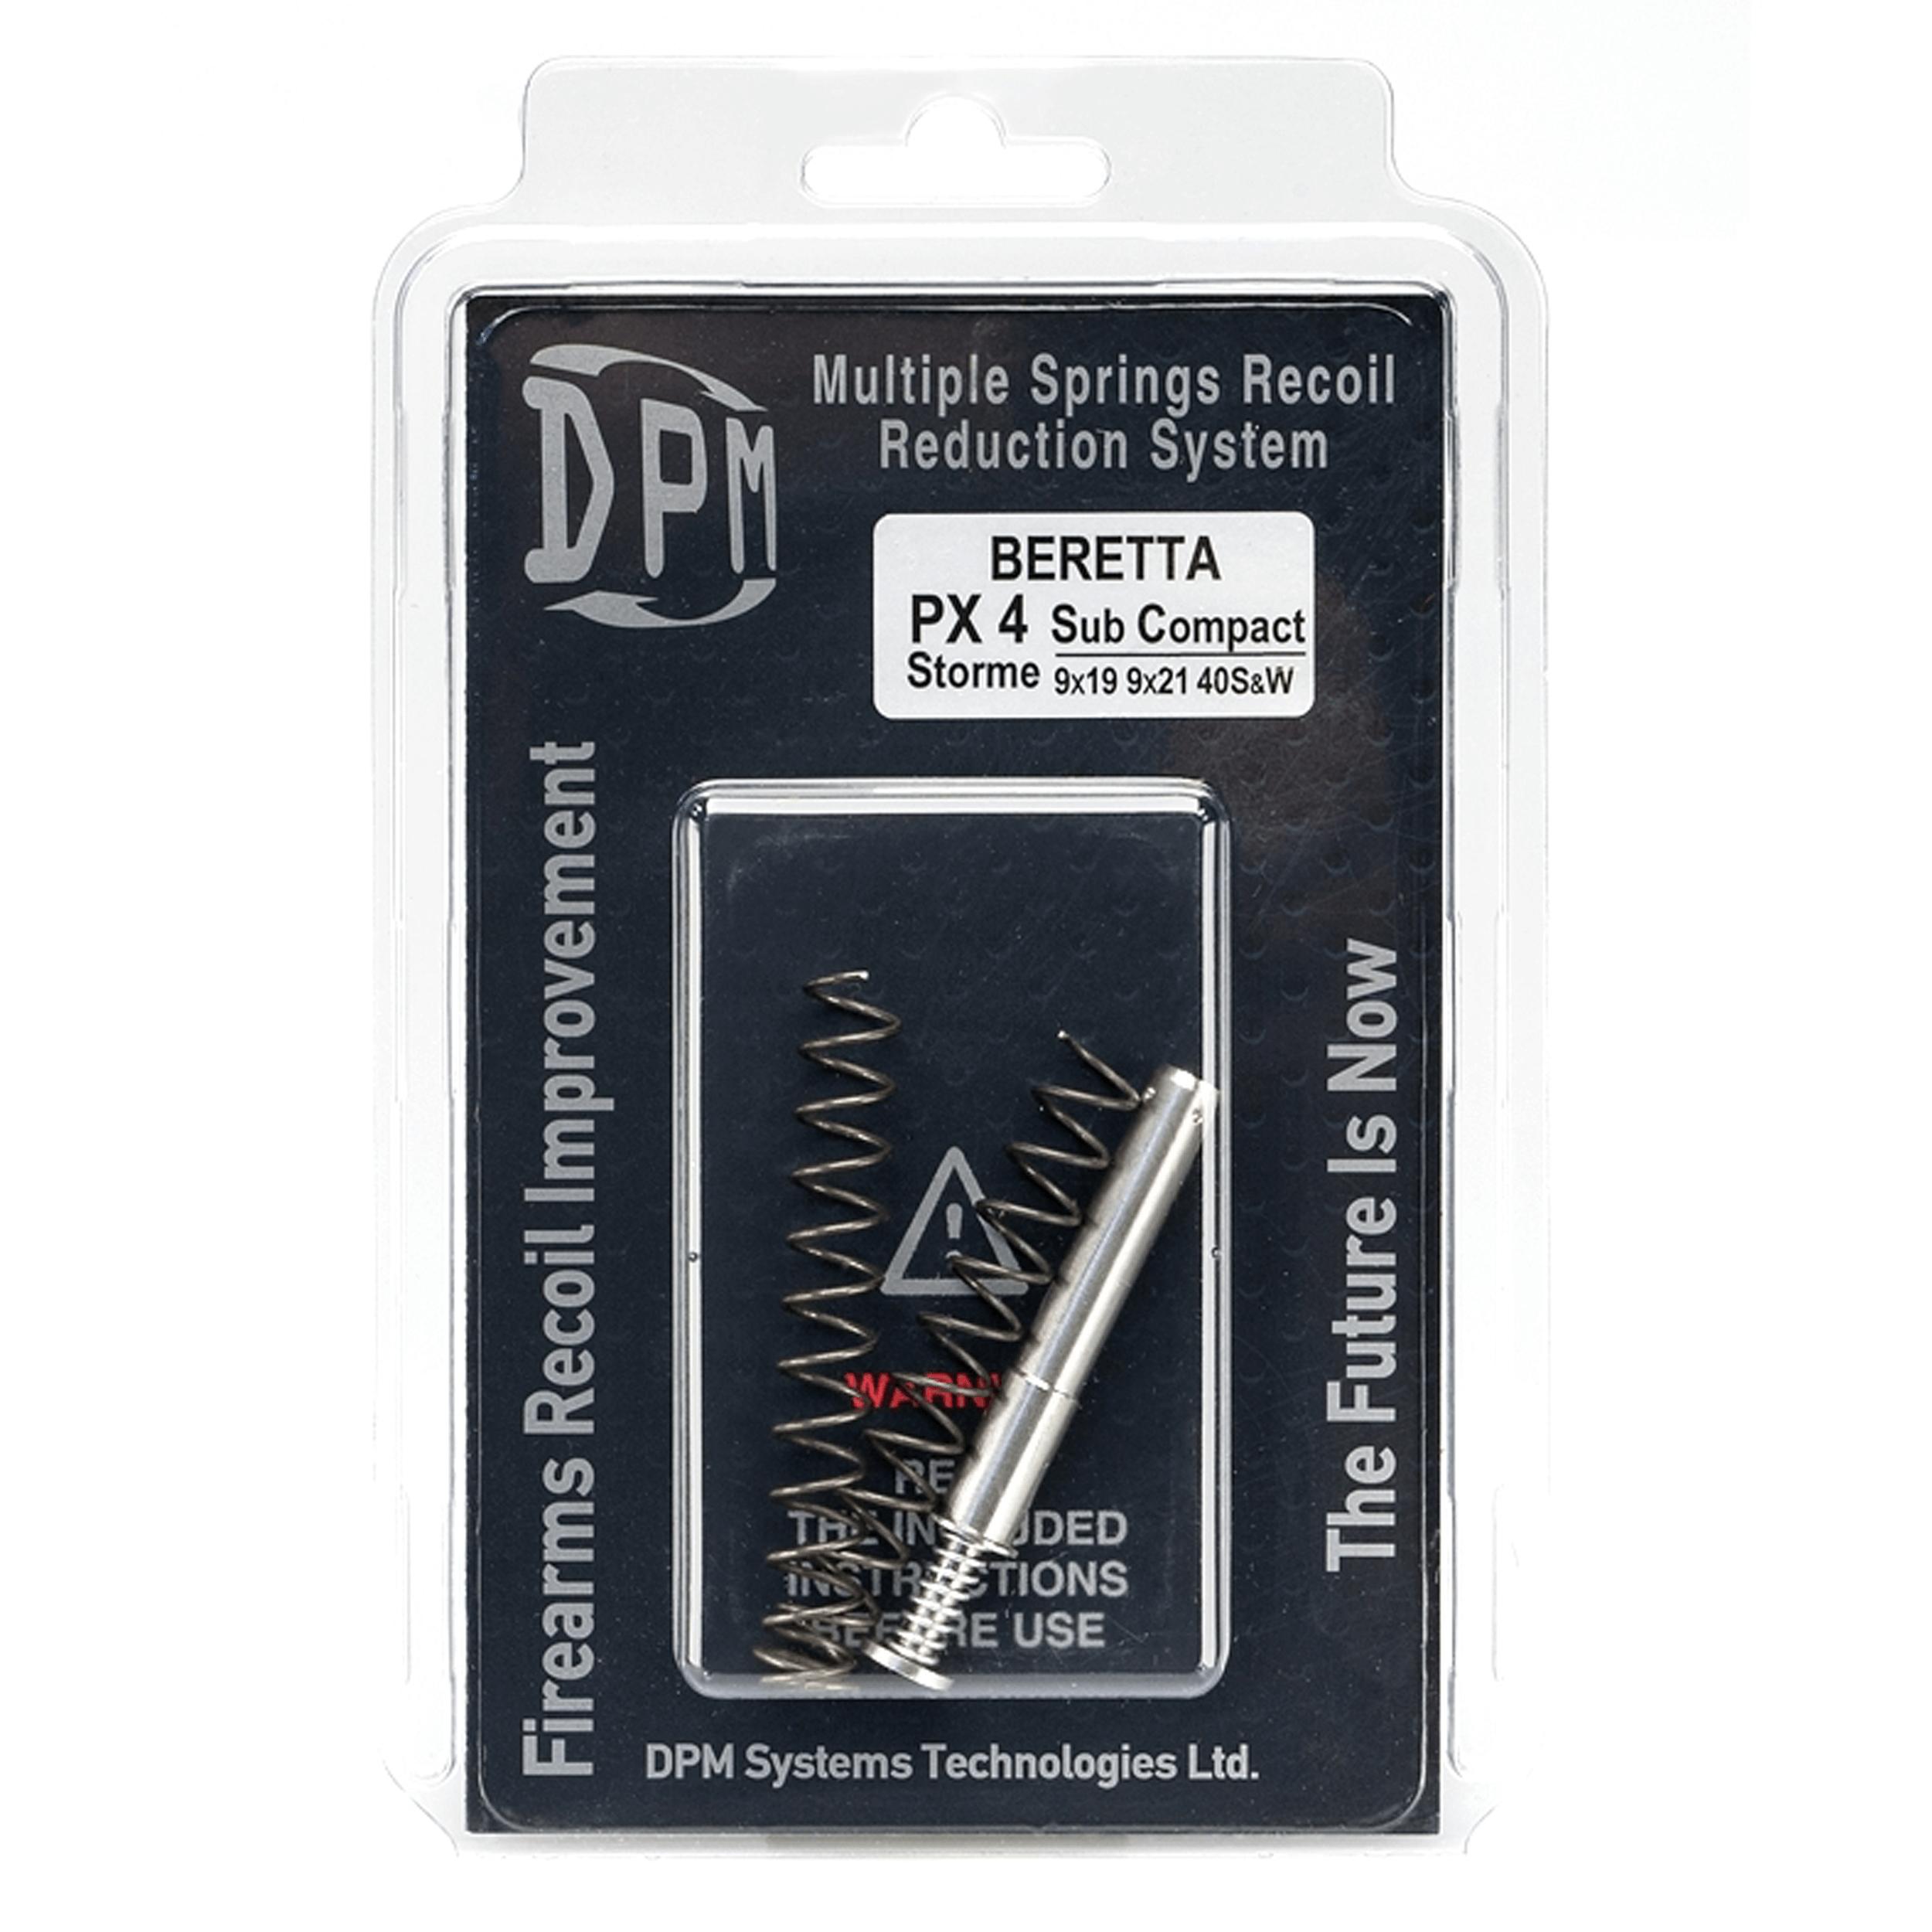 Beretta PX4 Subcompact - 9mm / 9X21 / .40 S&W